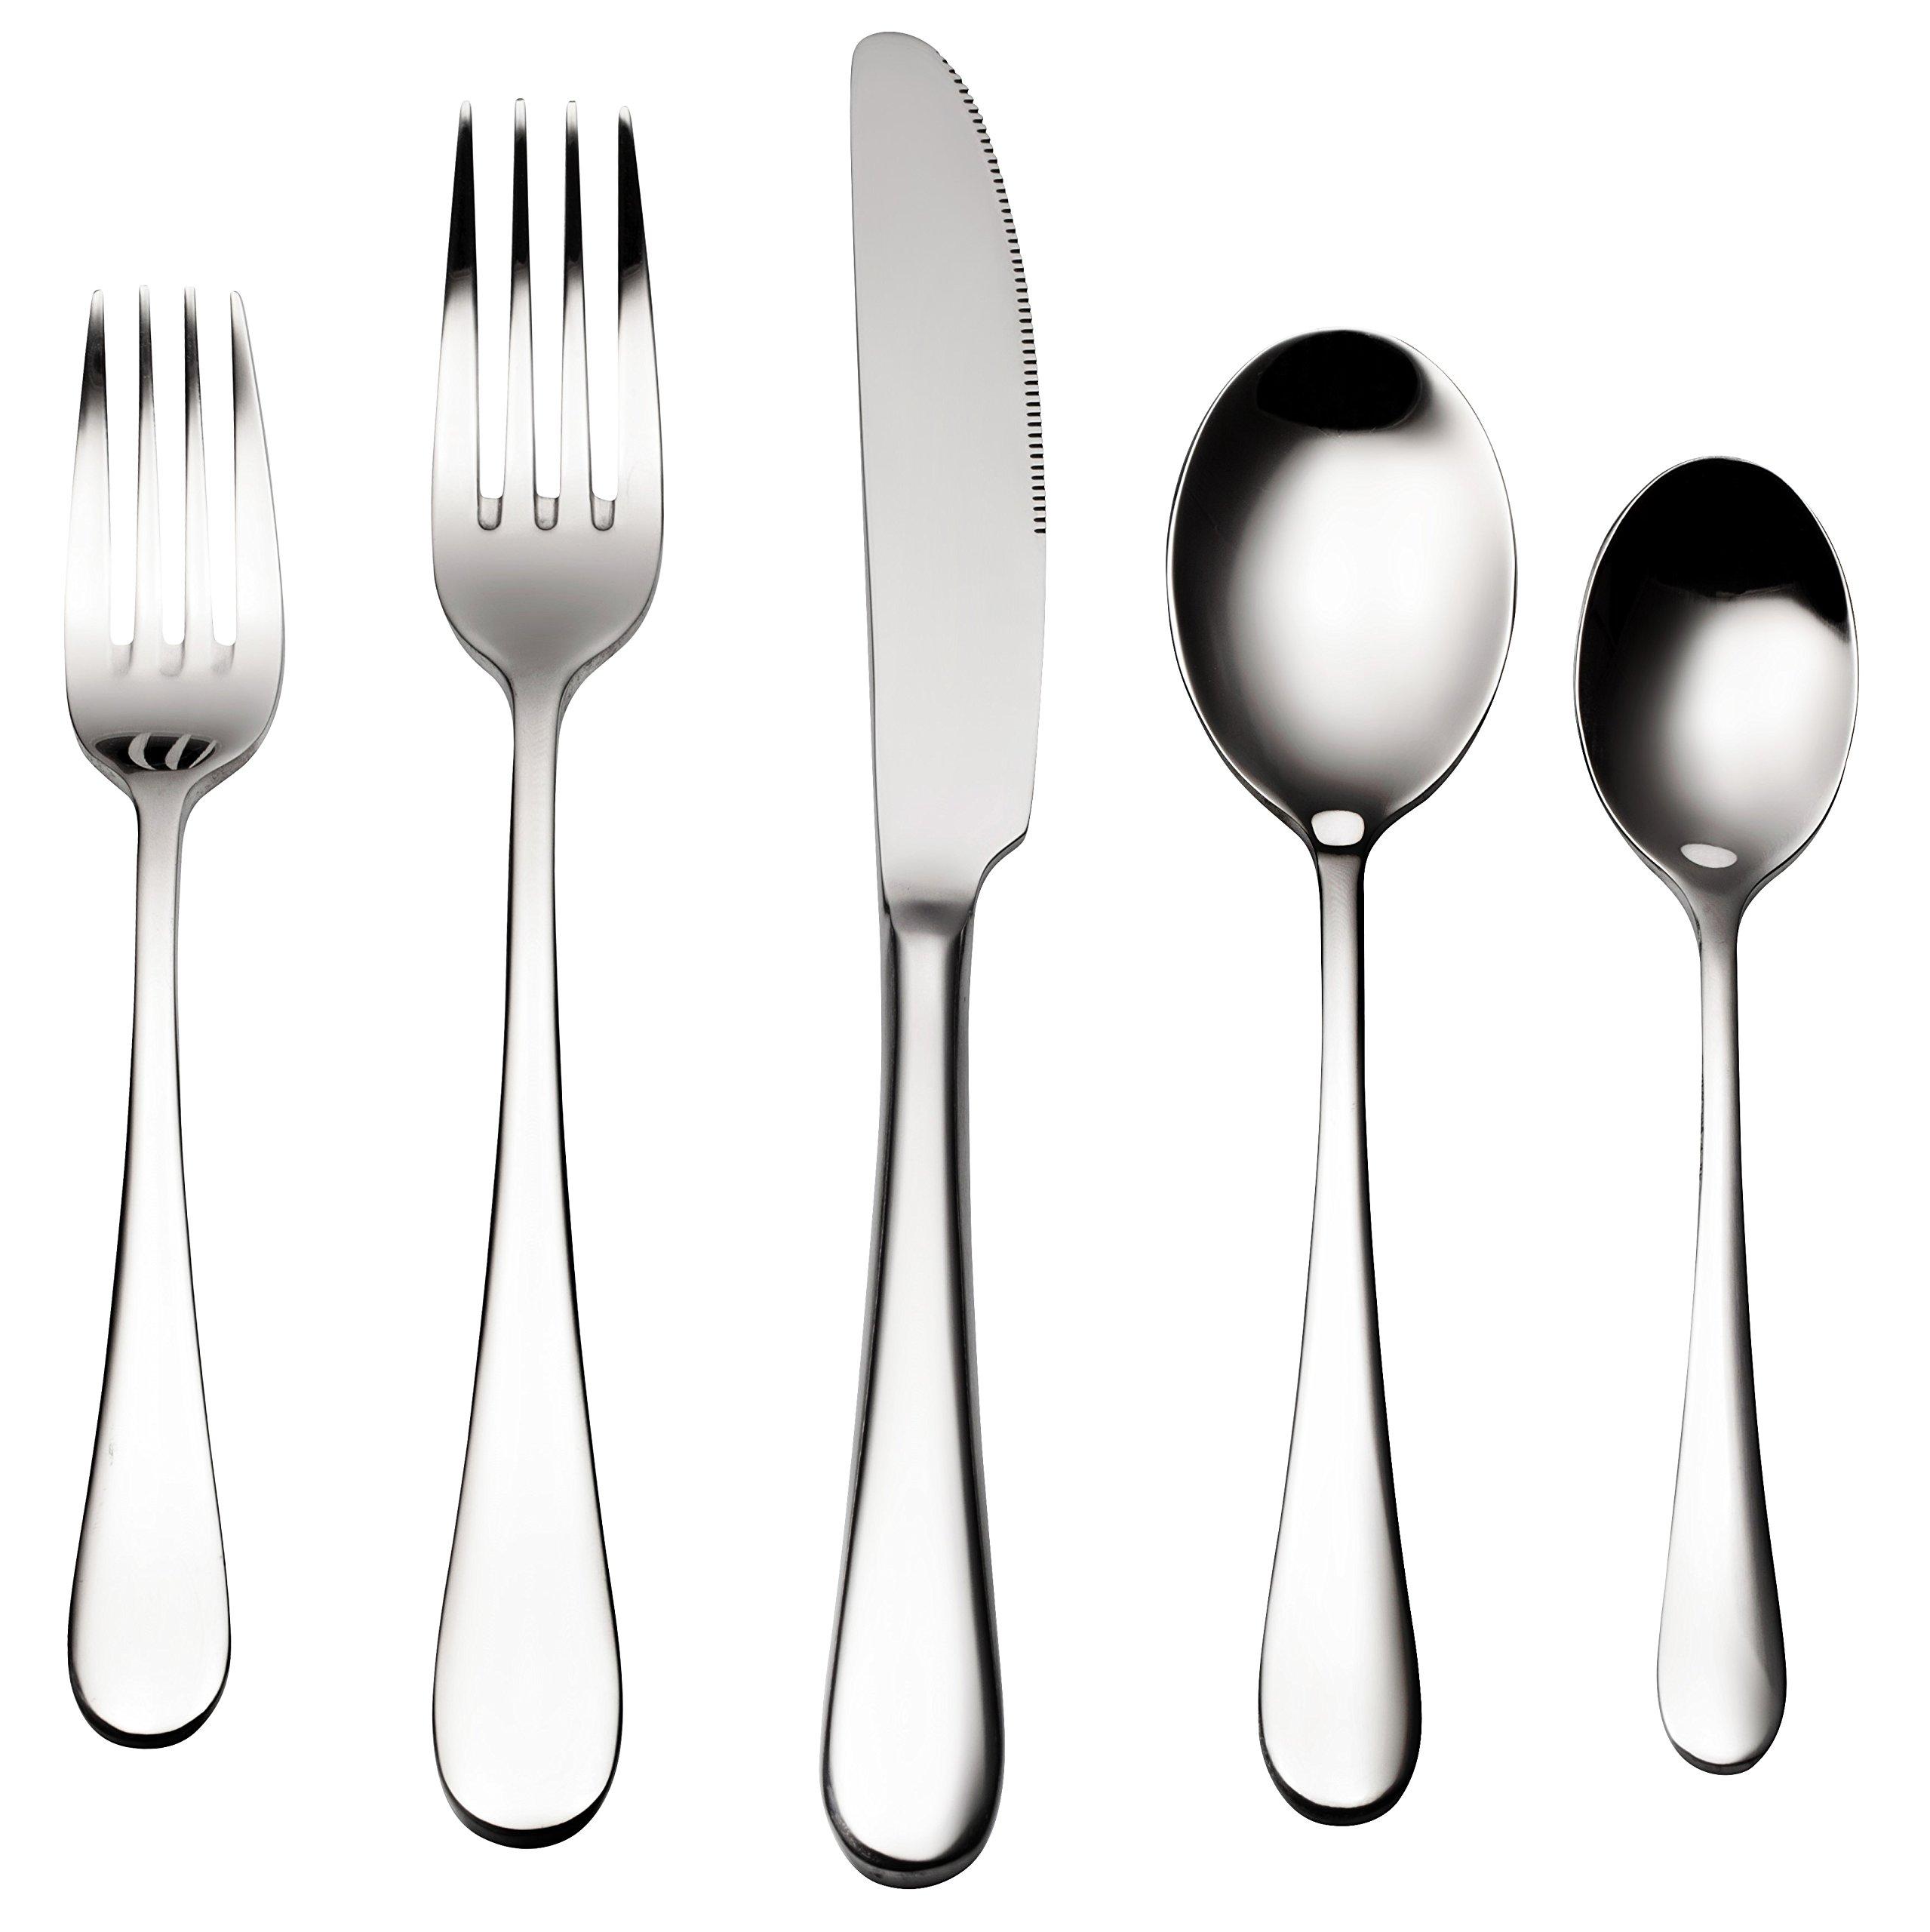 Bruntmor, ALBA Silverware Royal 45 Piece Flatware Cutlery Set, 18/10 Stainless Steel, Service for 8 w/Serving Pieces by Bruntmor